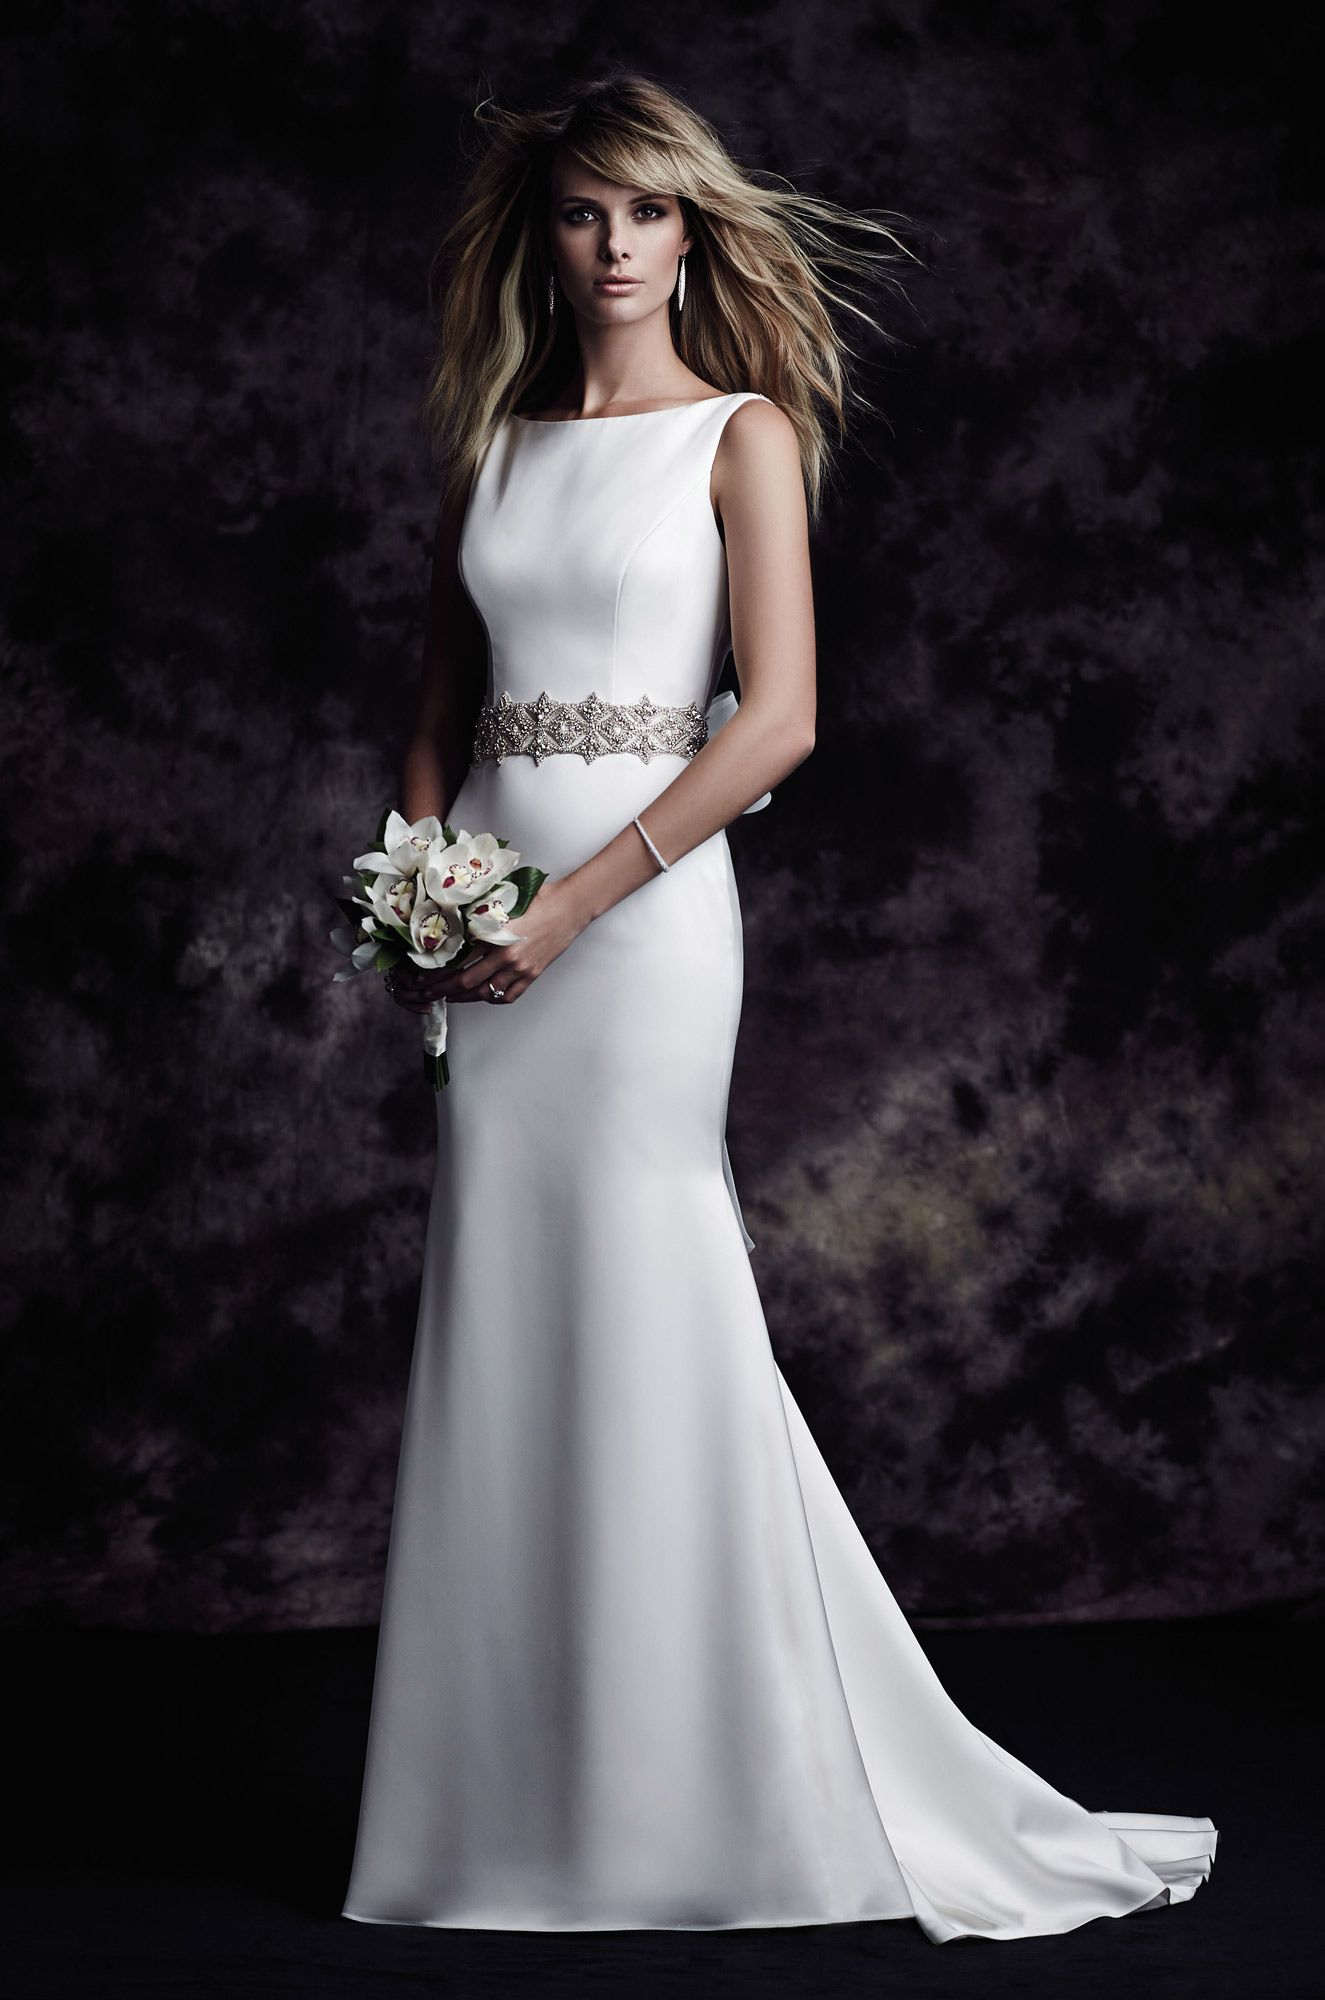 Satin Bateau Wedding Dress Style 4614 Paloma Blanca Bateau Wedding Dress Wedding Dresses Kleinfeld Fit And Flare Wedding Dress [ 2000 x 1325 Pixel ]